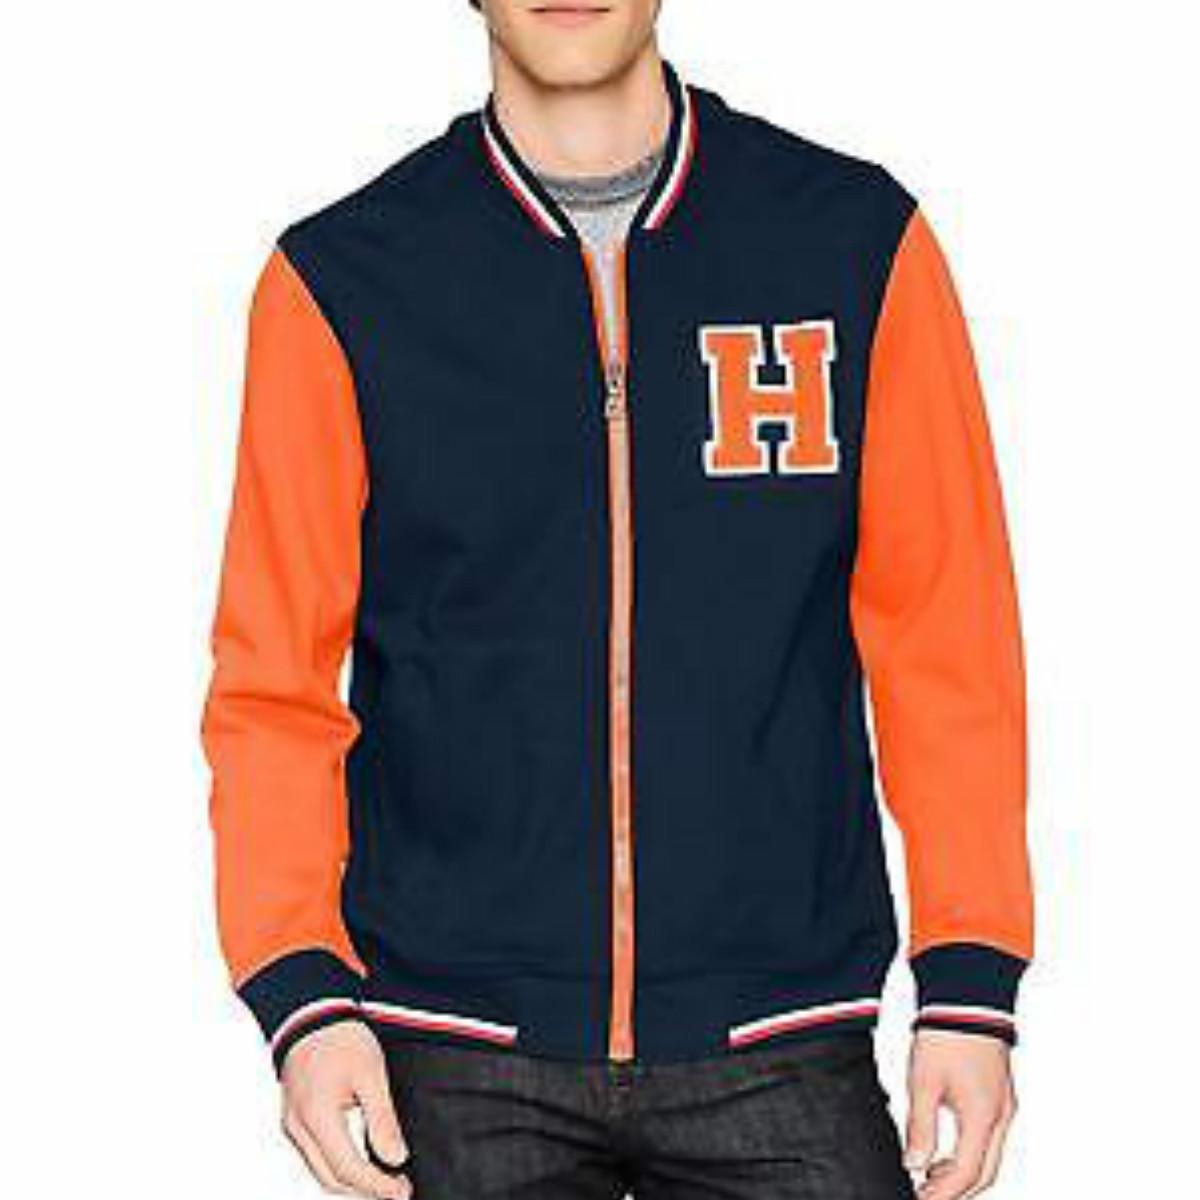 TOMMY HILFIGER メンズ トミーフィルフィガートラックジャケットオレンジ・ネイビー